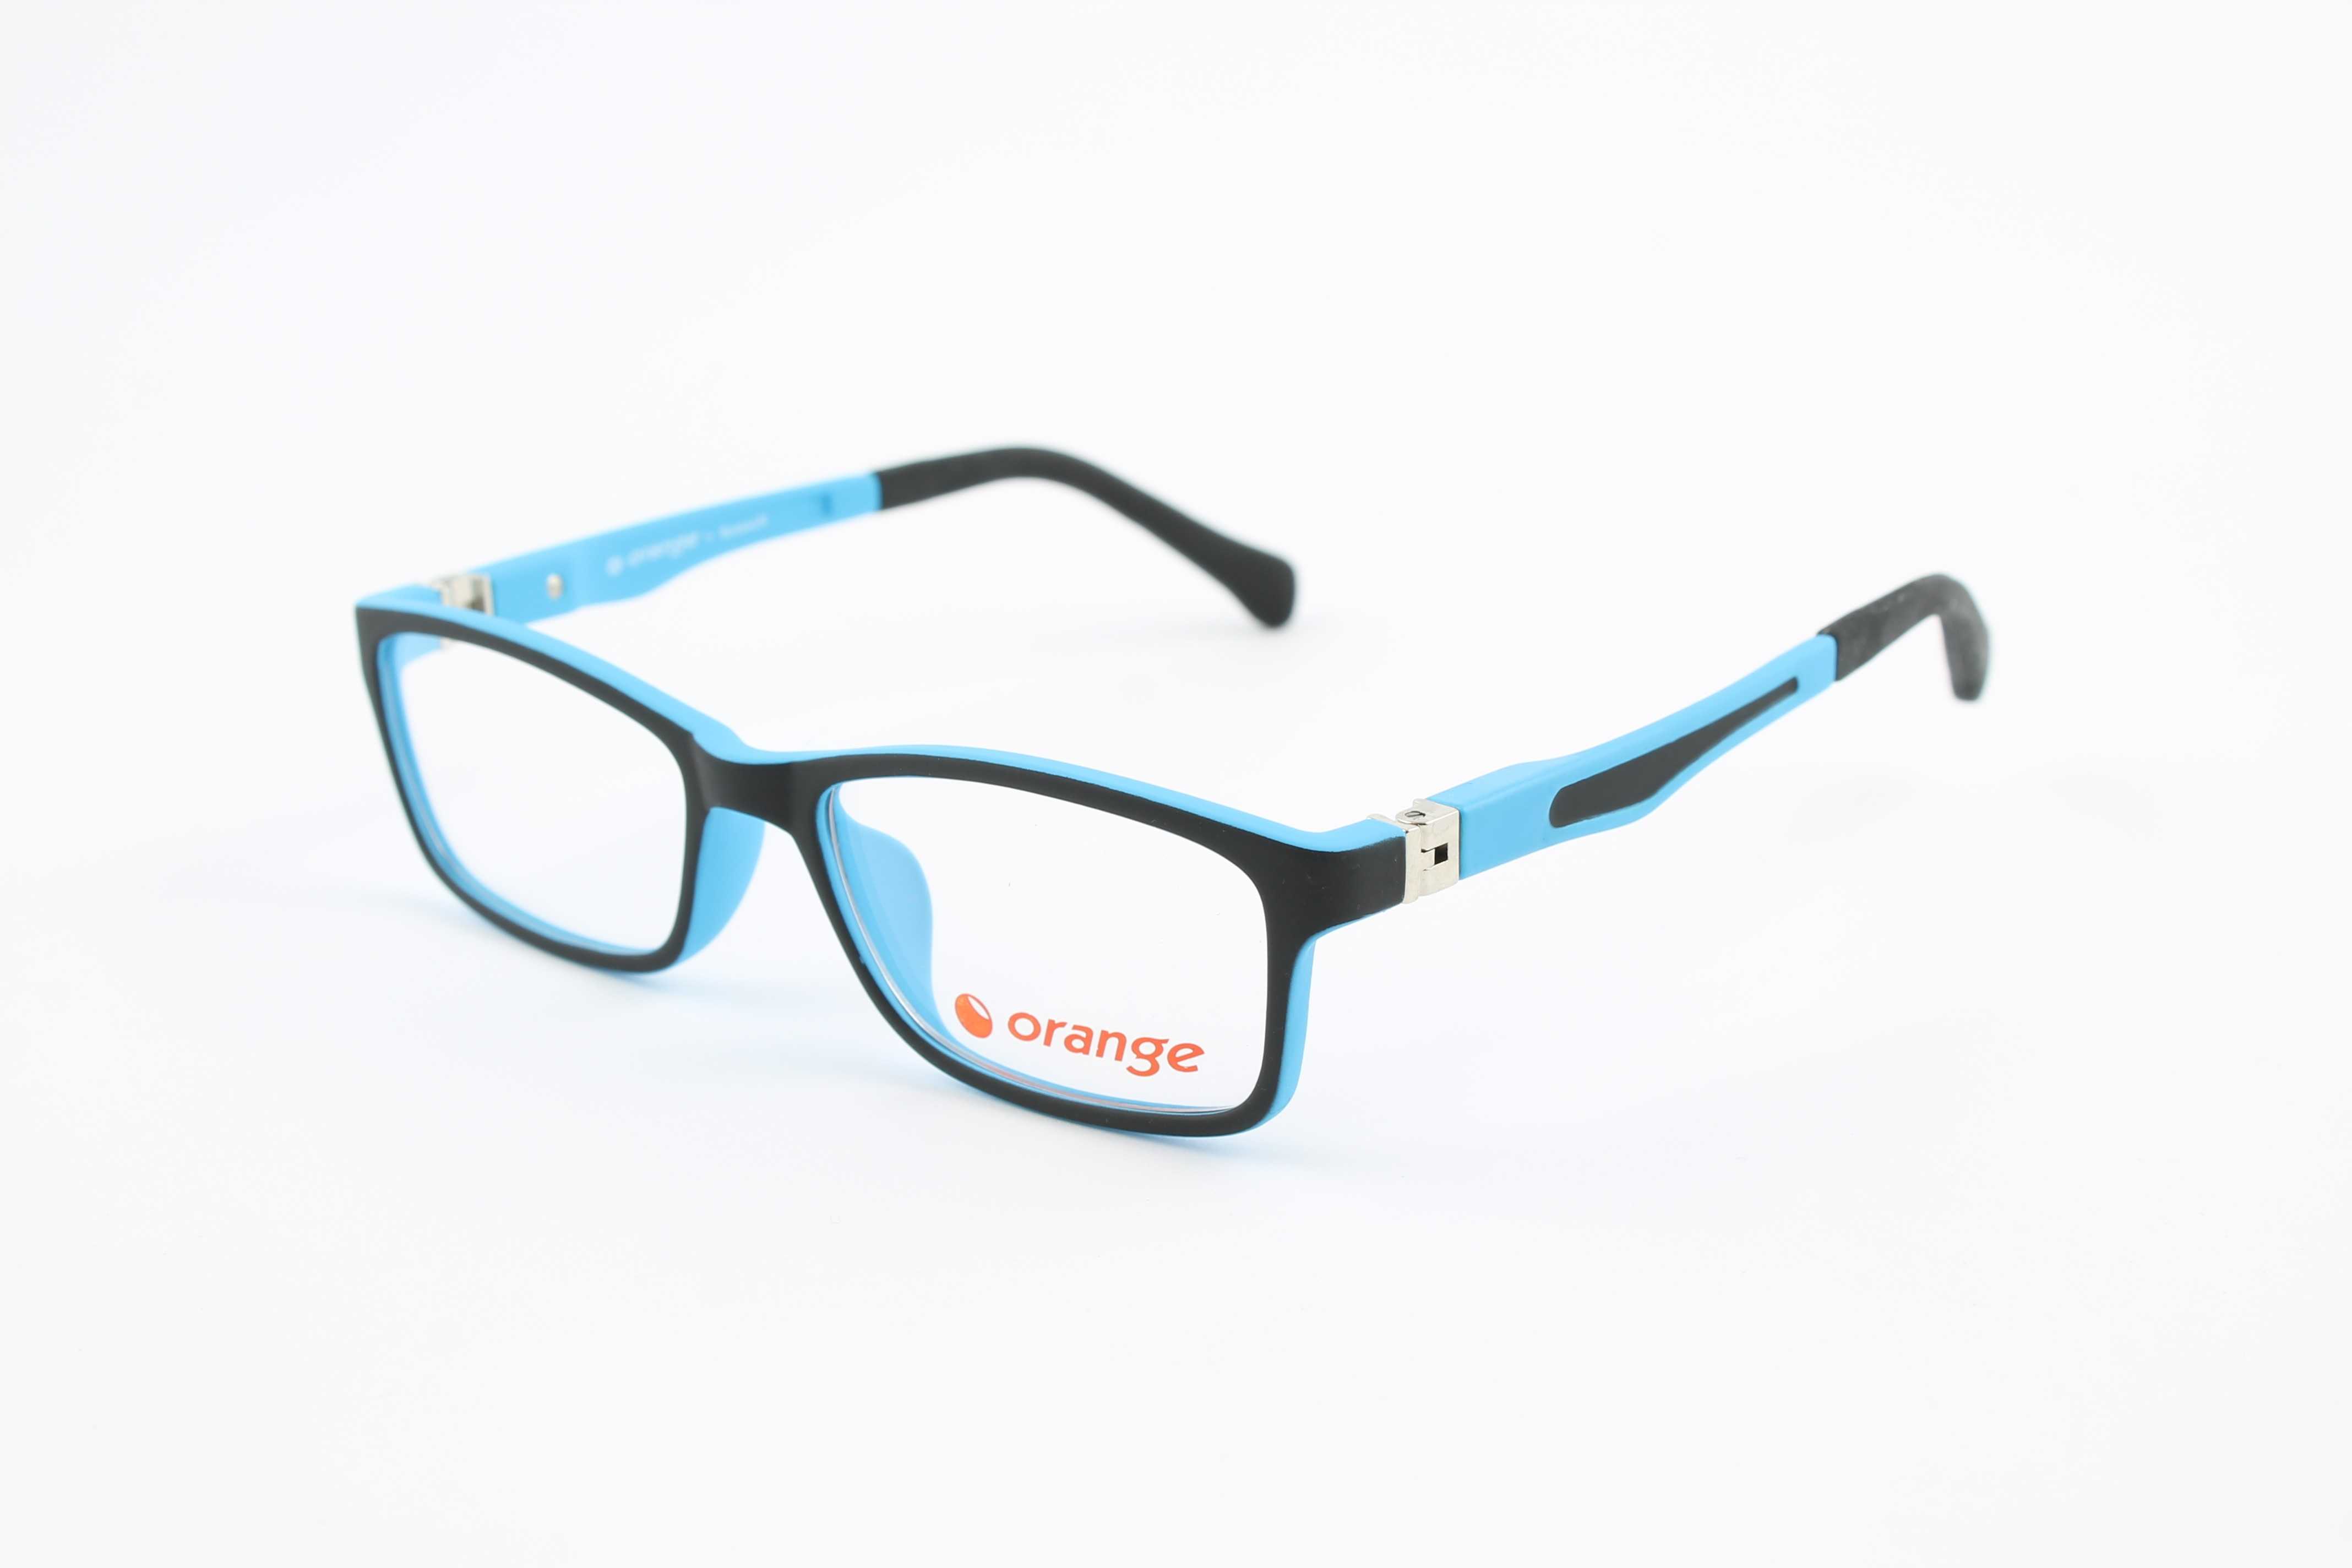 Orange by Bergman - 8068 C3 szemüvegkeretek 9cb0c8f19e